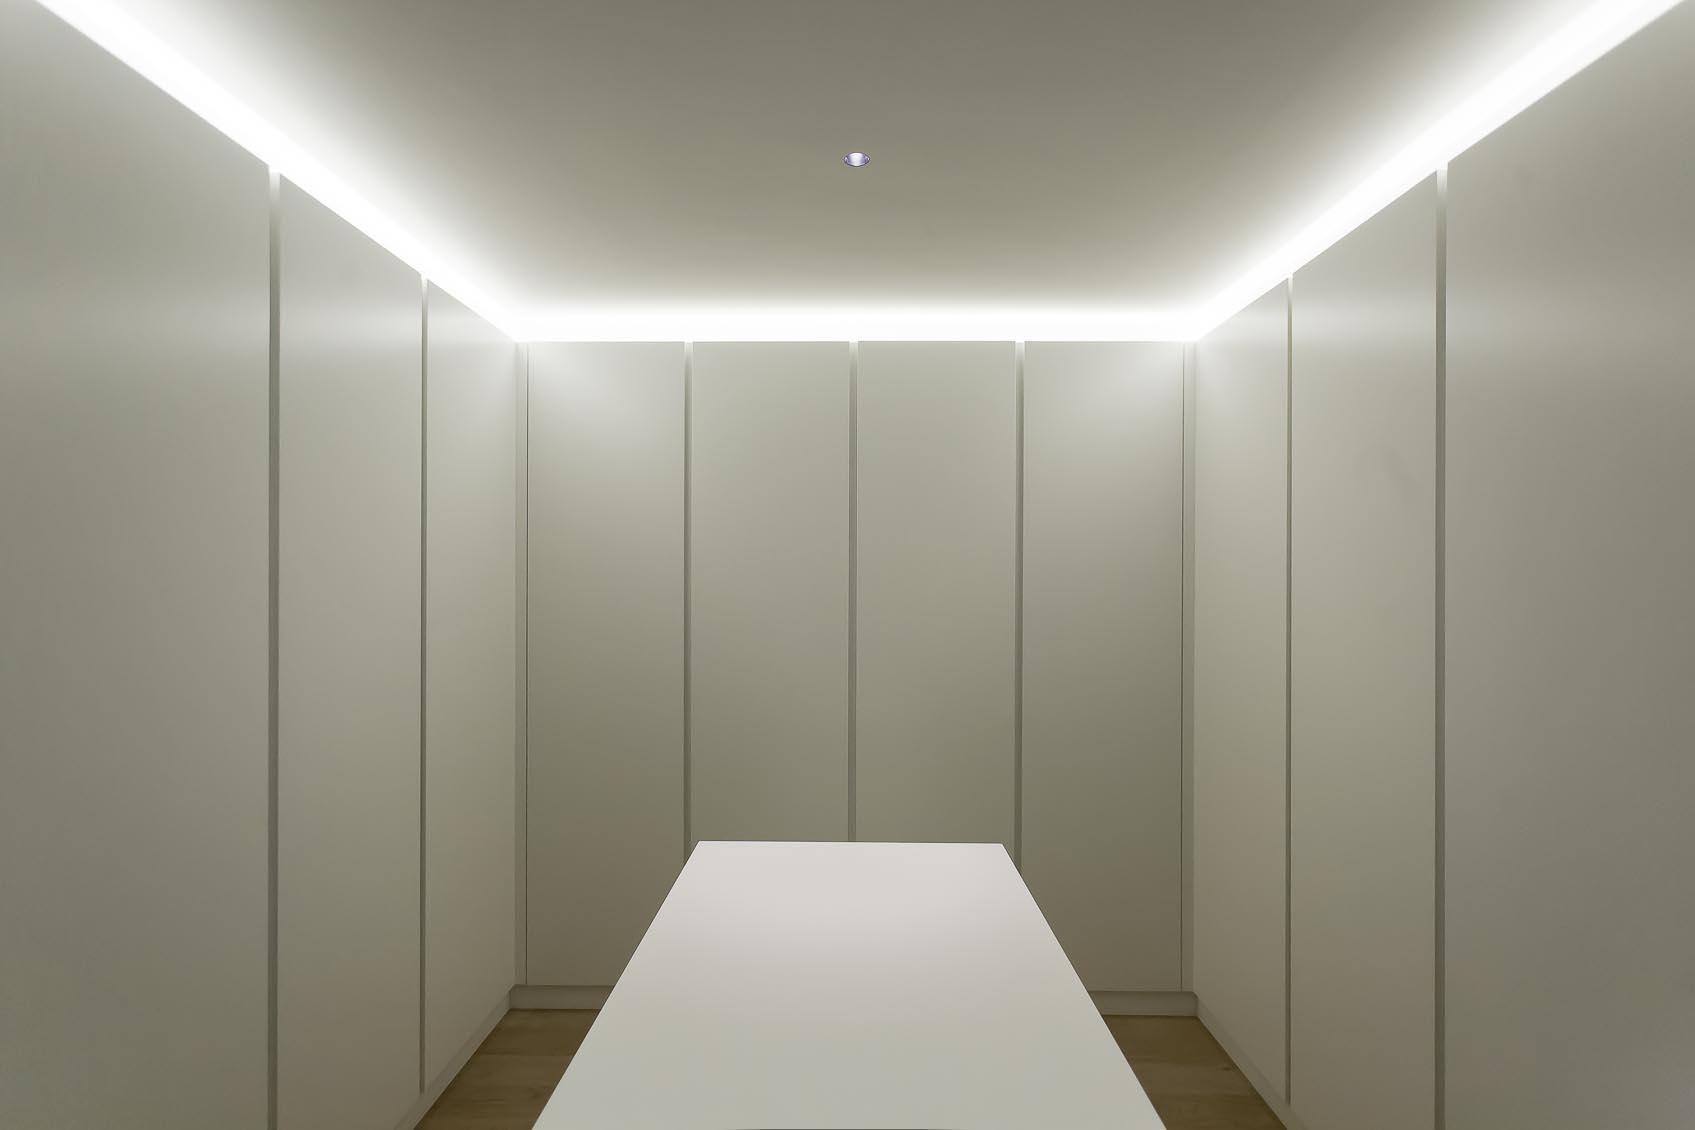 indirecte led verlichting in dressing room - Verlichting | Pinterest ...